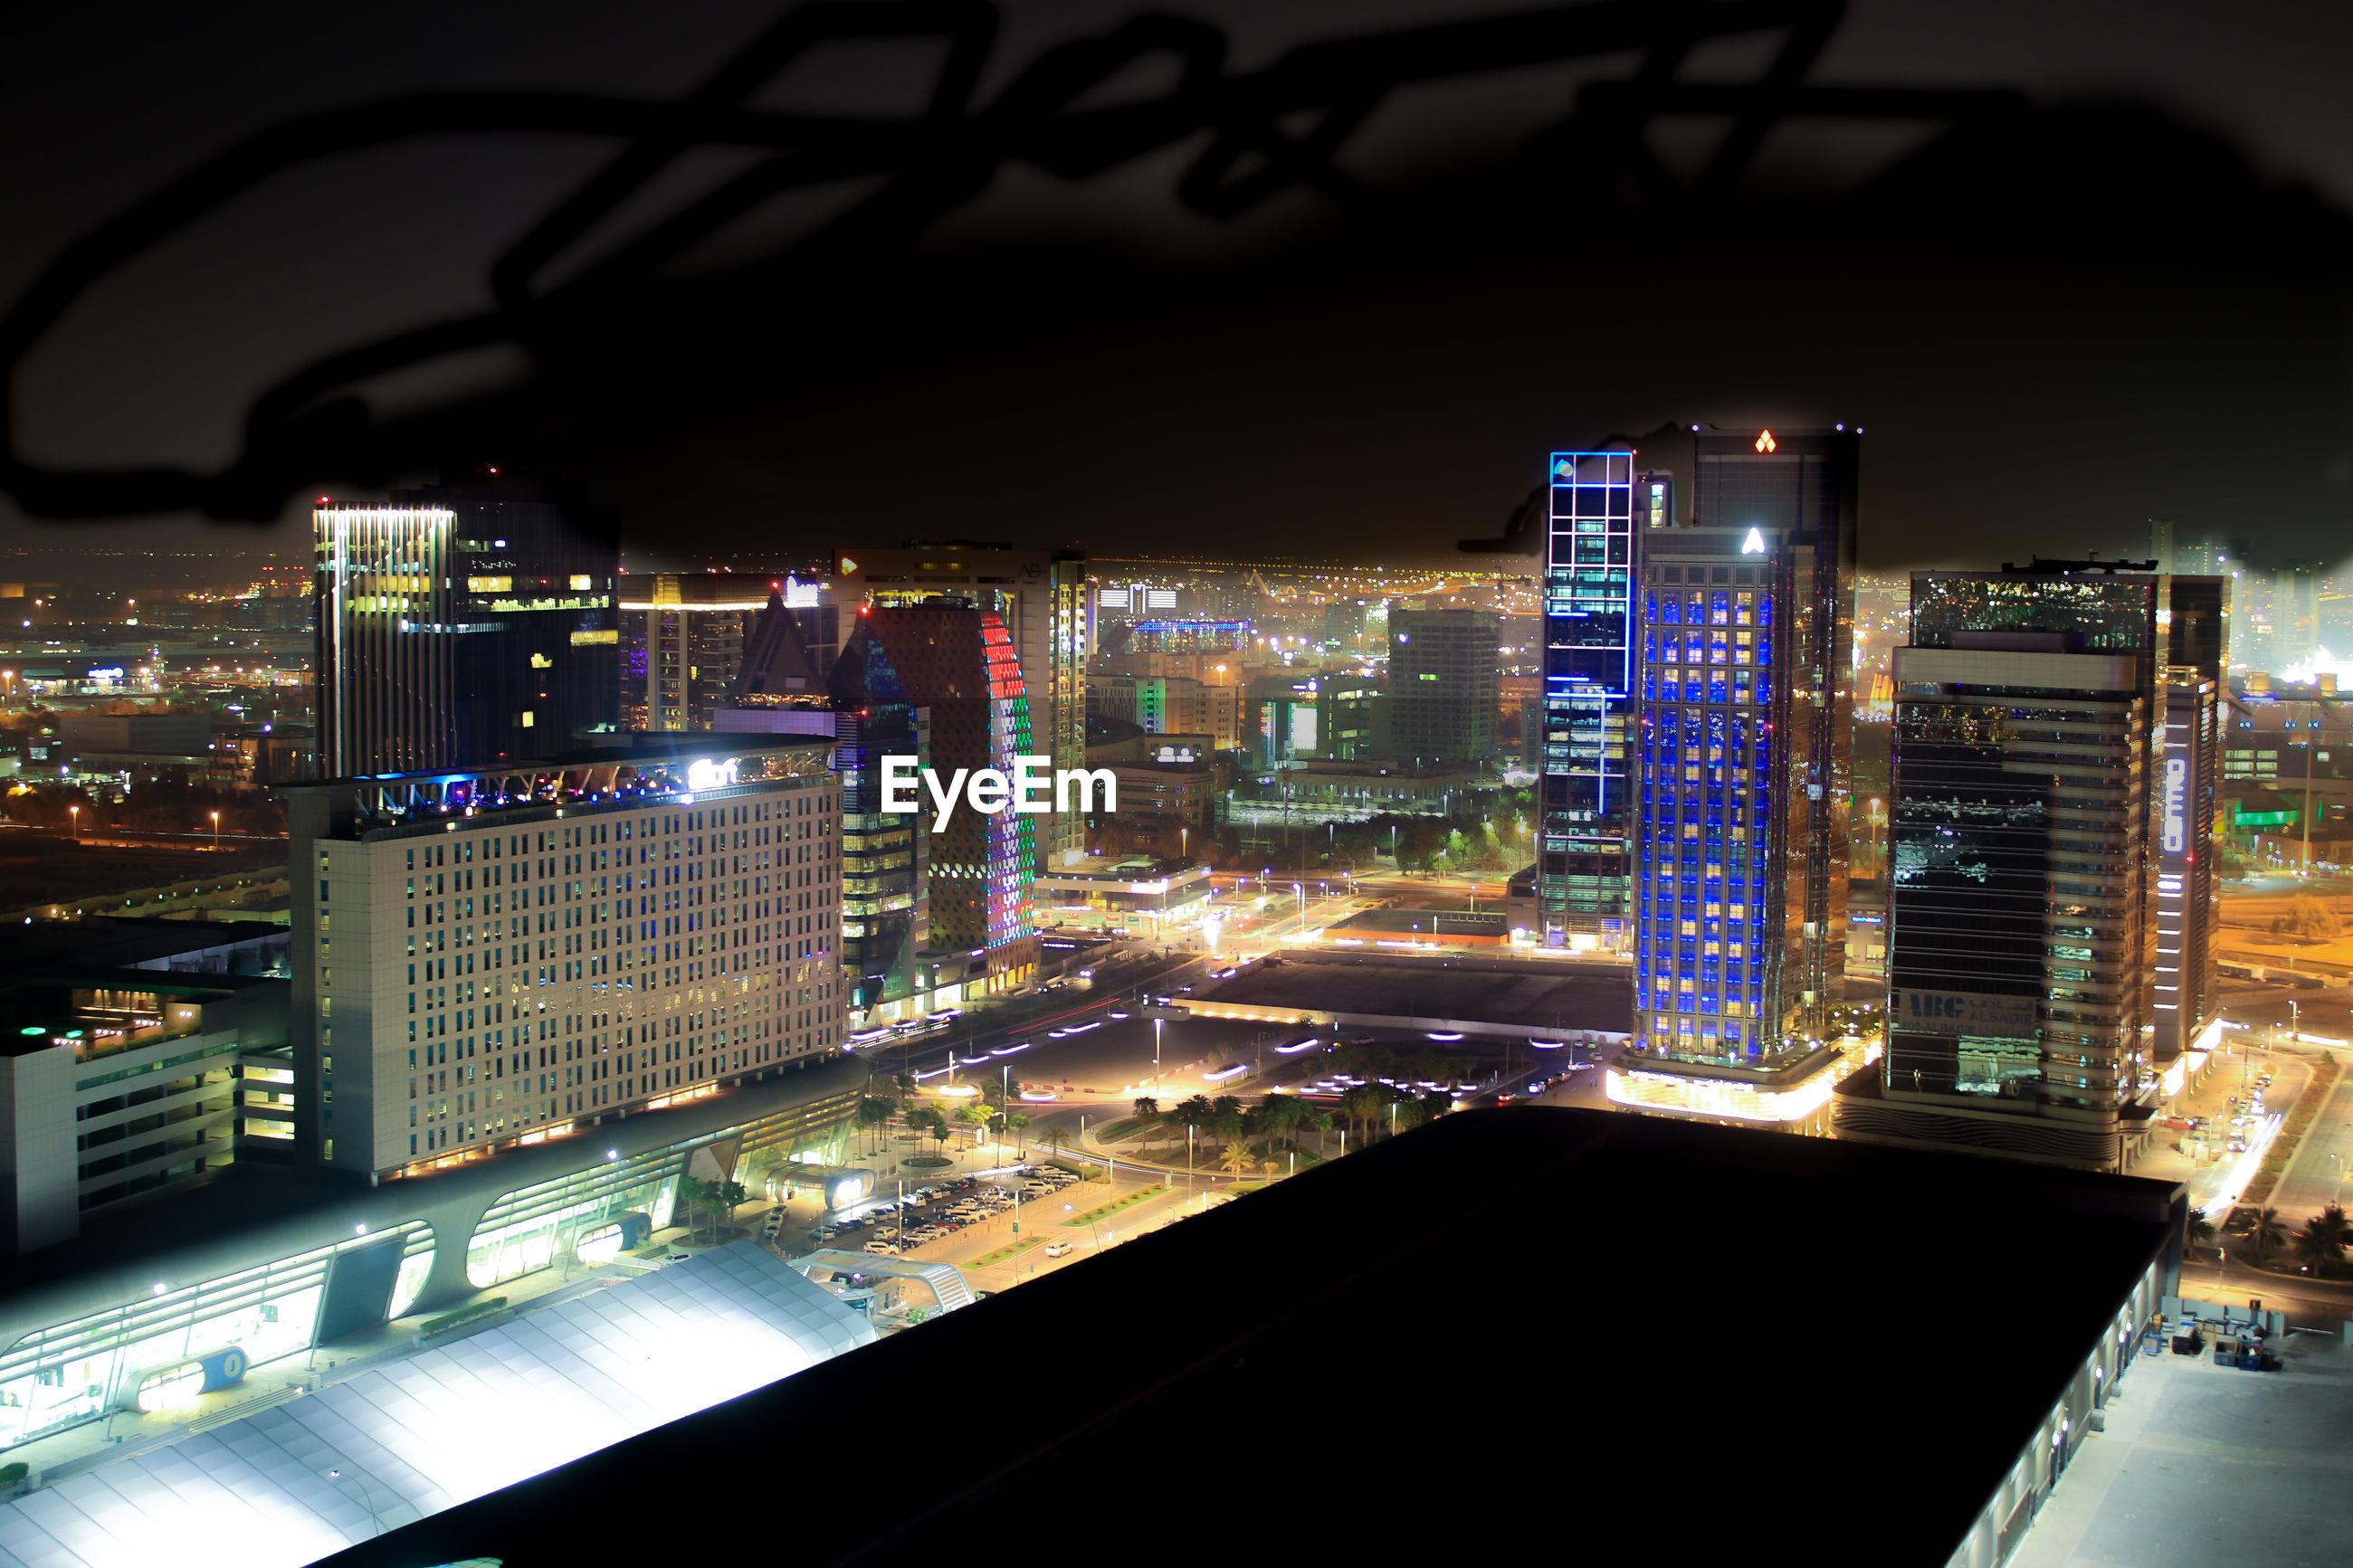 ILLUMINATED MODERN CITYSCAPE SEEN FROM NIGHT AT CITY